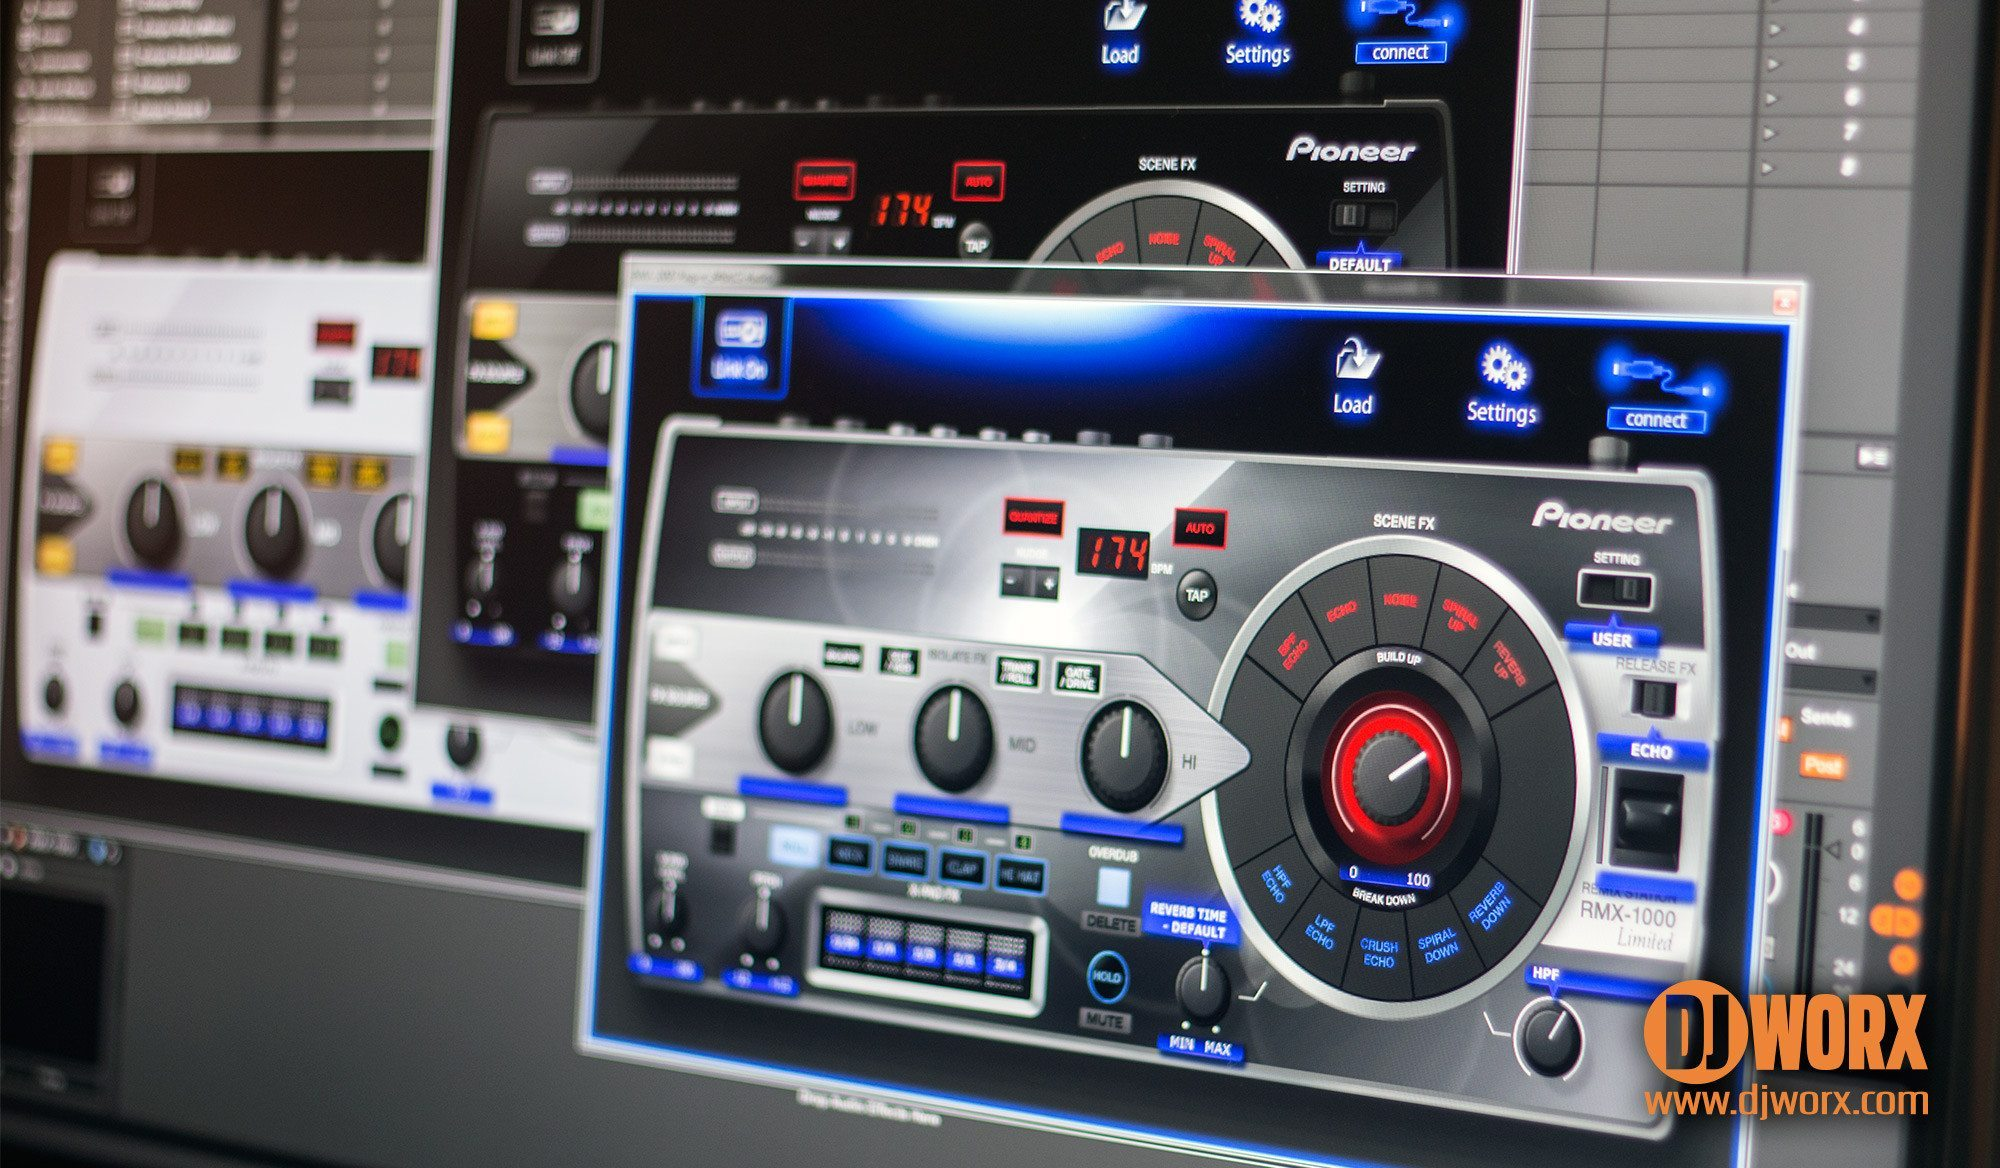 rmx1000-plugin